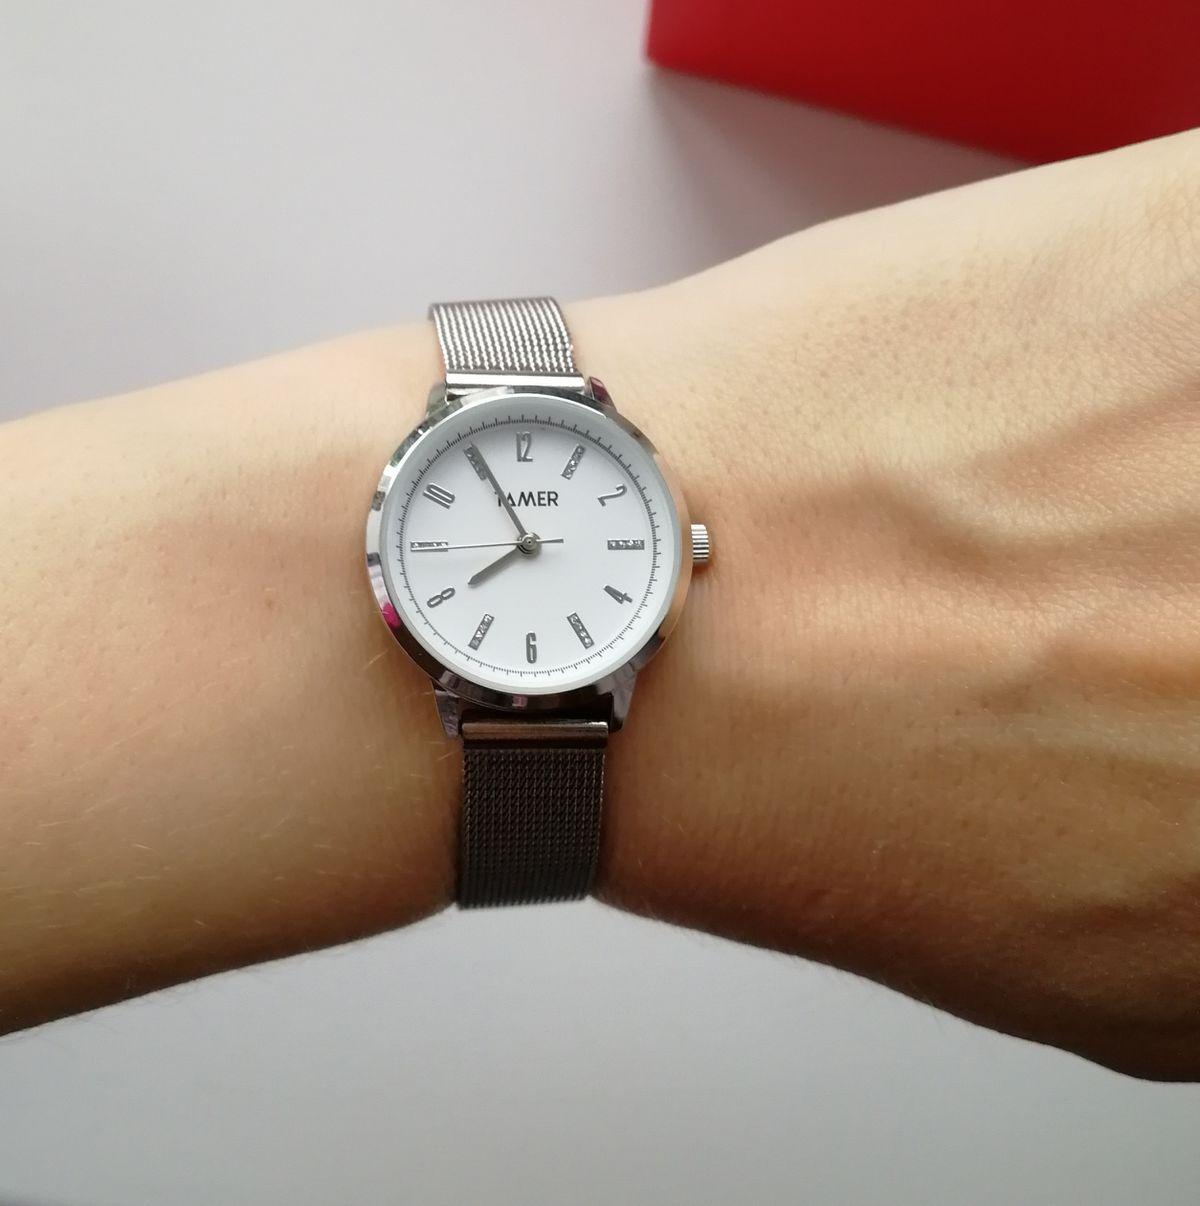 "Наручные женские часы "" Tamer"""